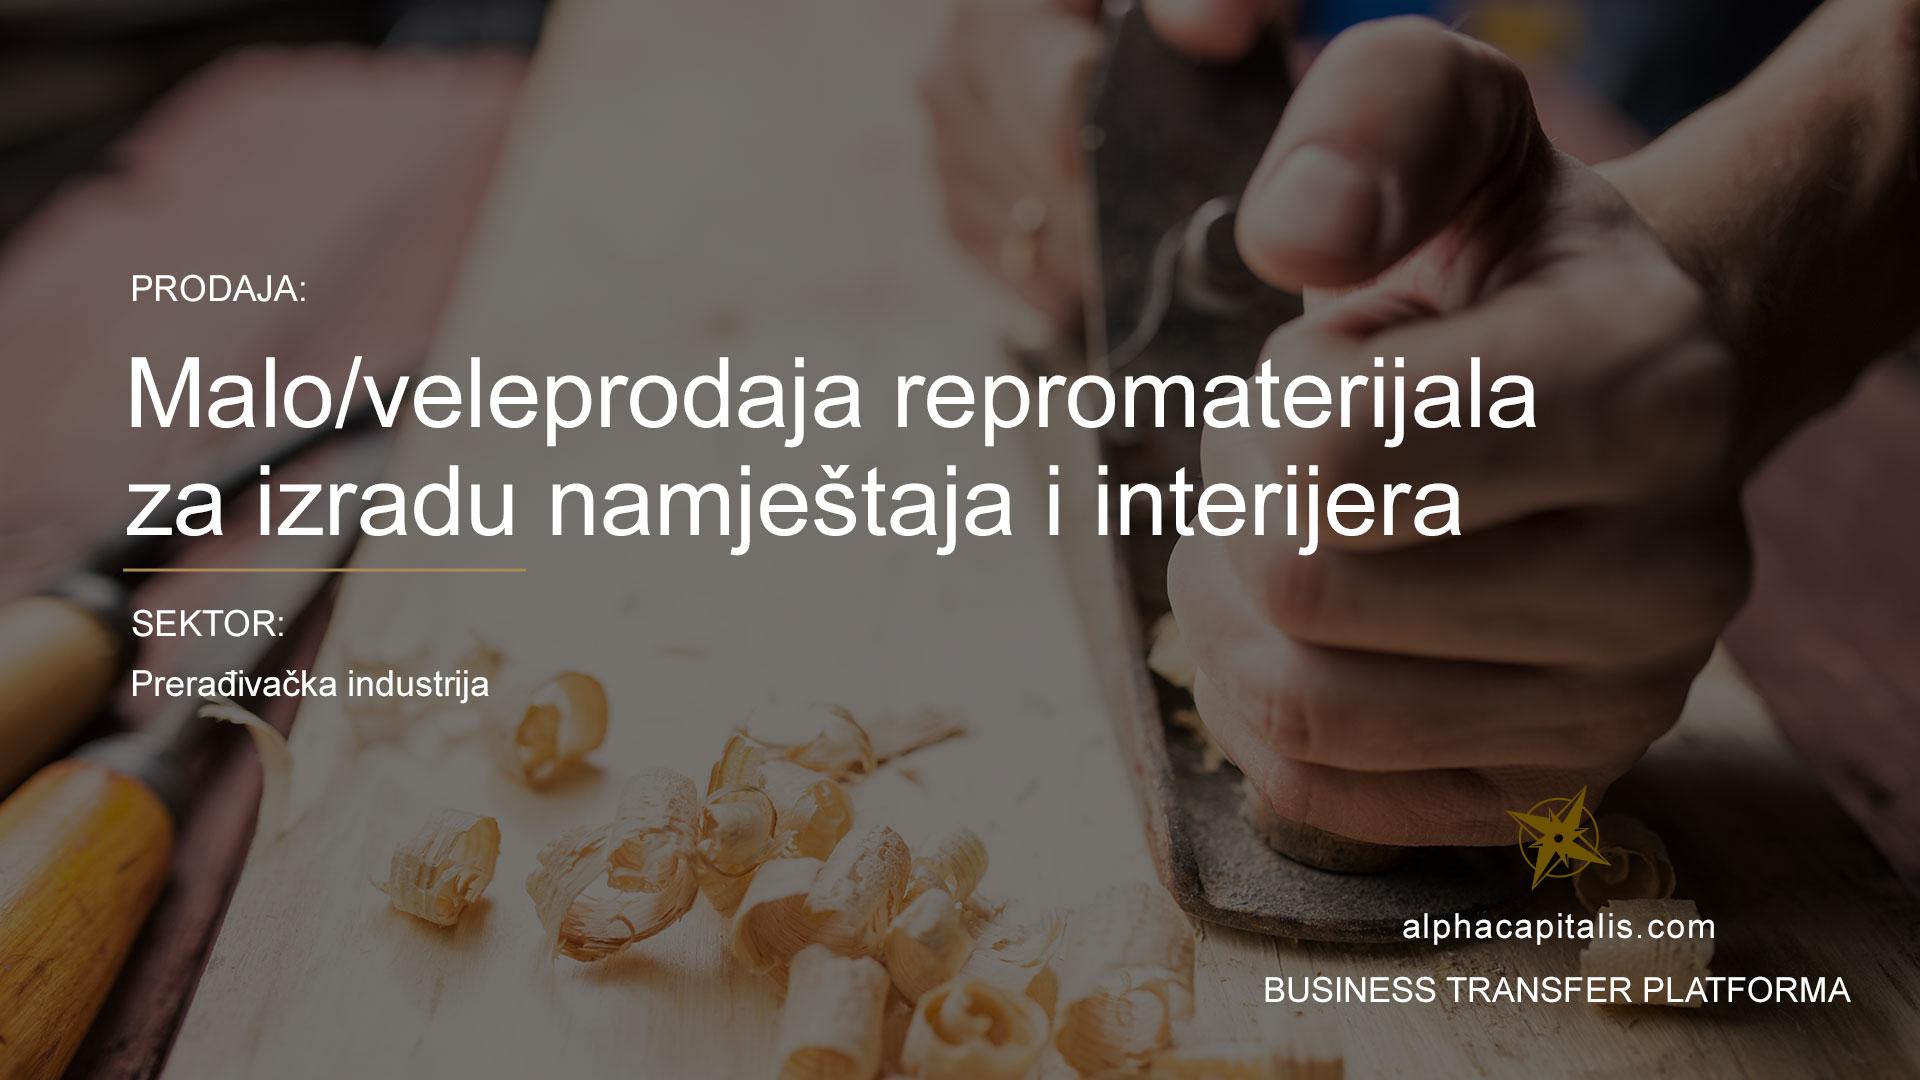 Alpha-Capitalis-Business-Transfer-Platforma_prodaja